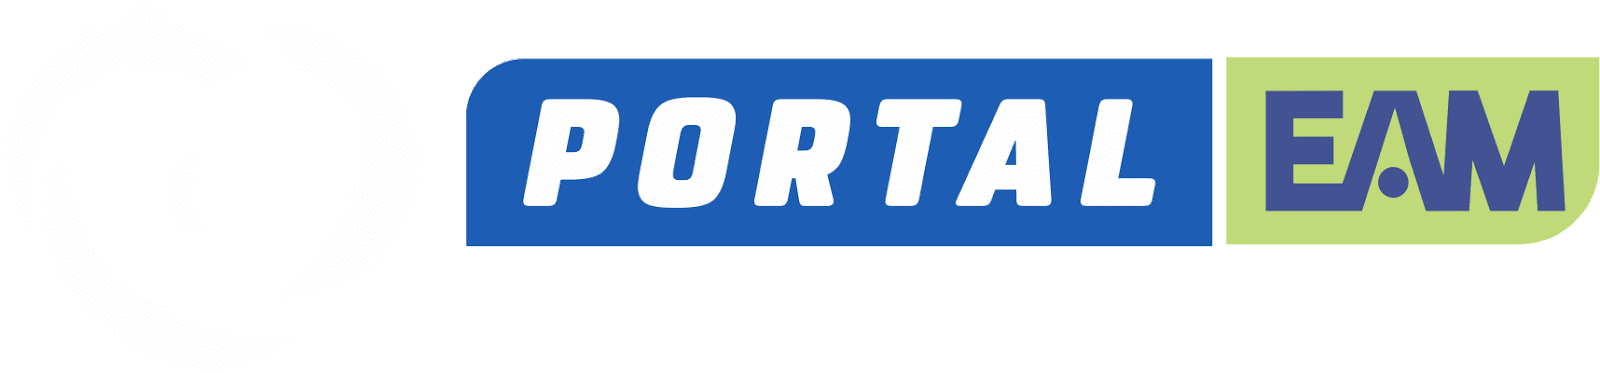 portaleam